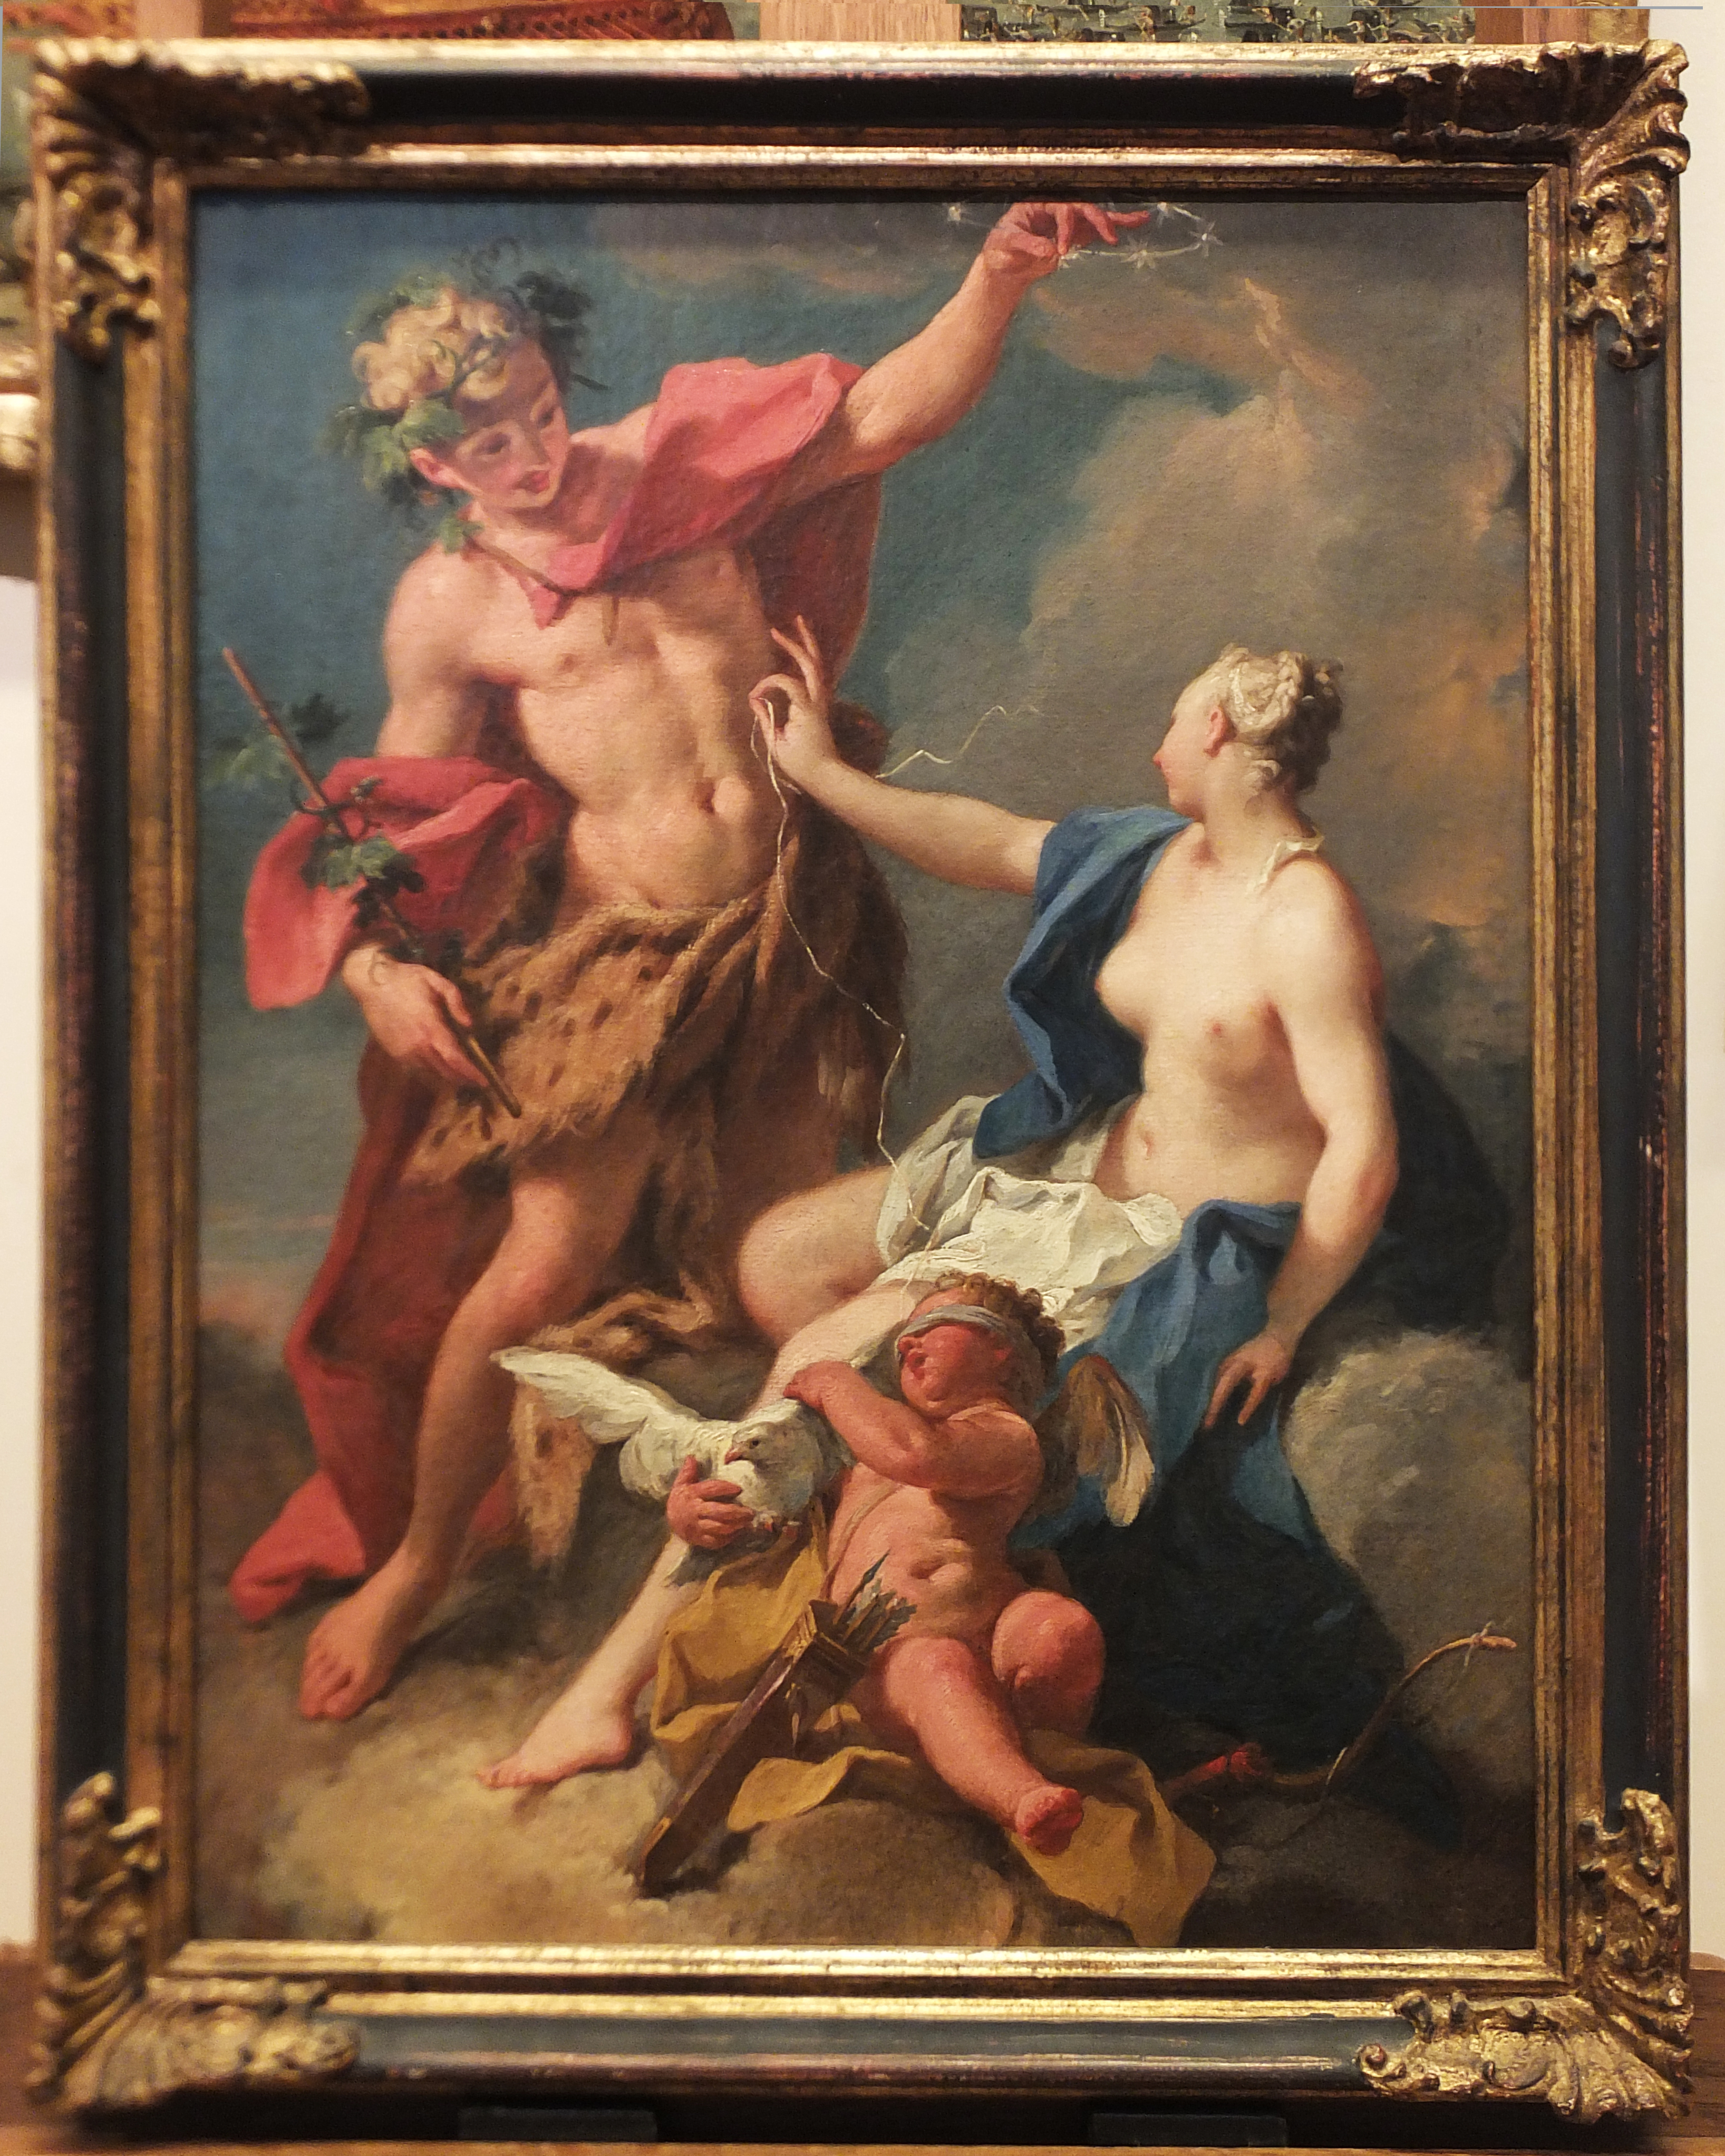 mnr/MNR00789/MNR789_face_encadree-copyright-Musee_du_Louvre-Departement_des_Peintures.jpg